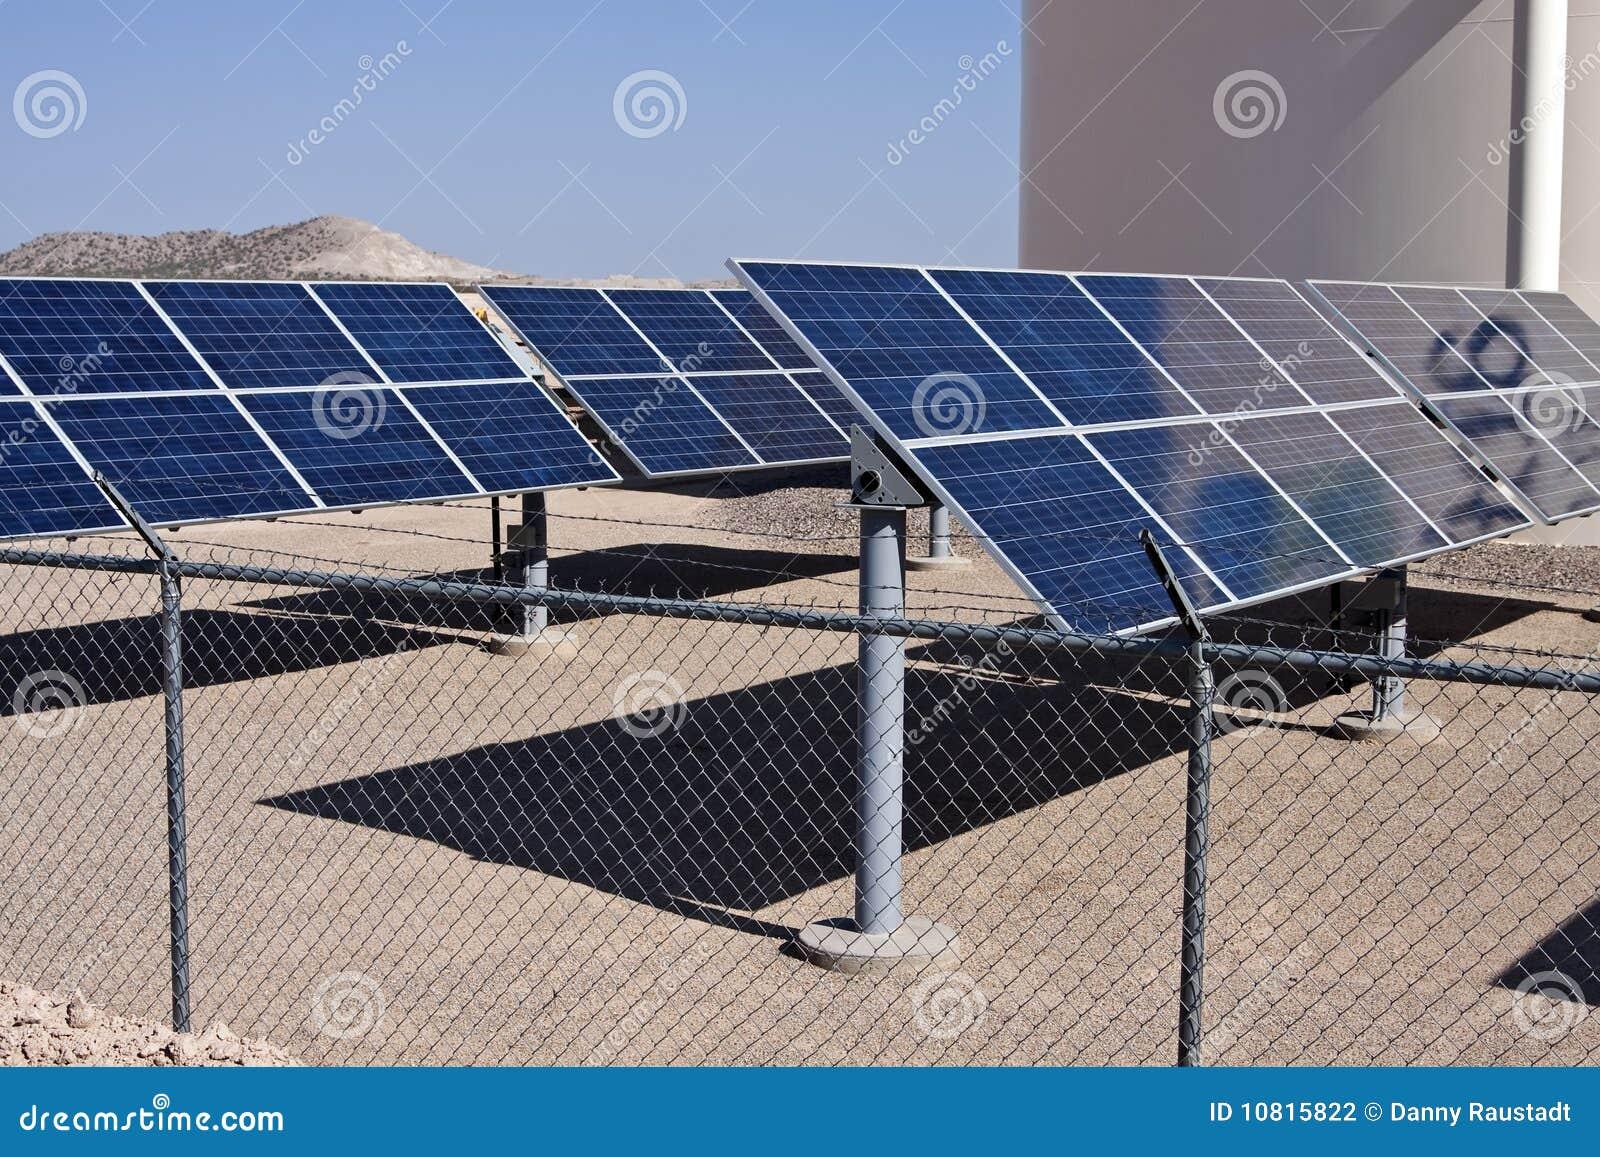 Solar Panel Energy Collector Farm Stock Photo Image Of